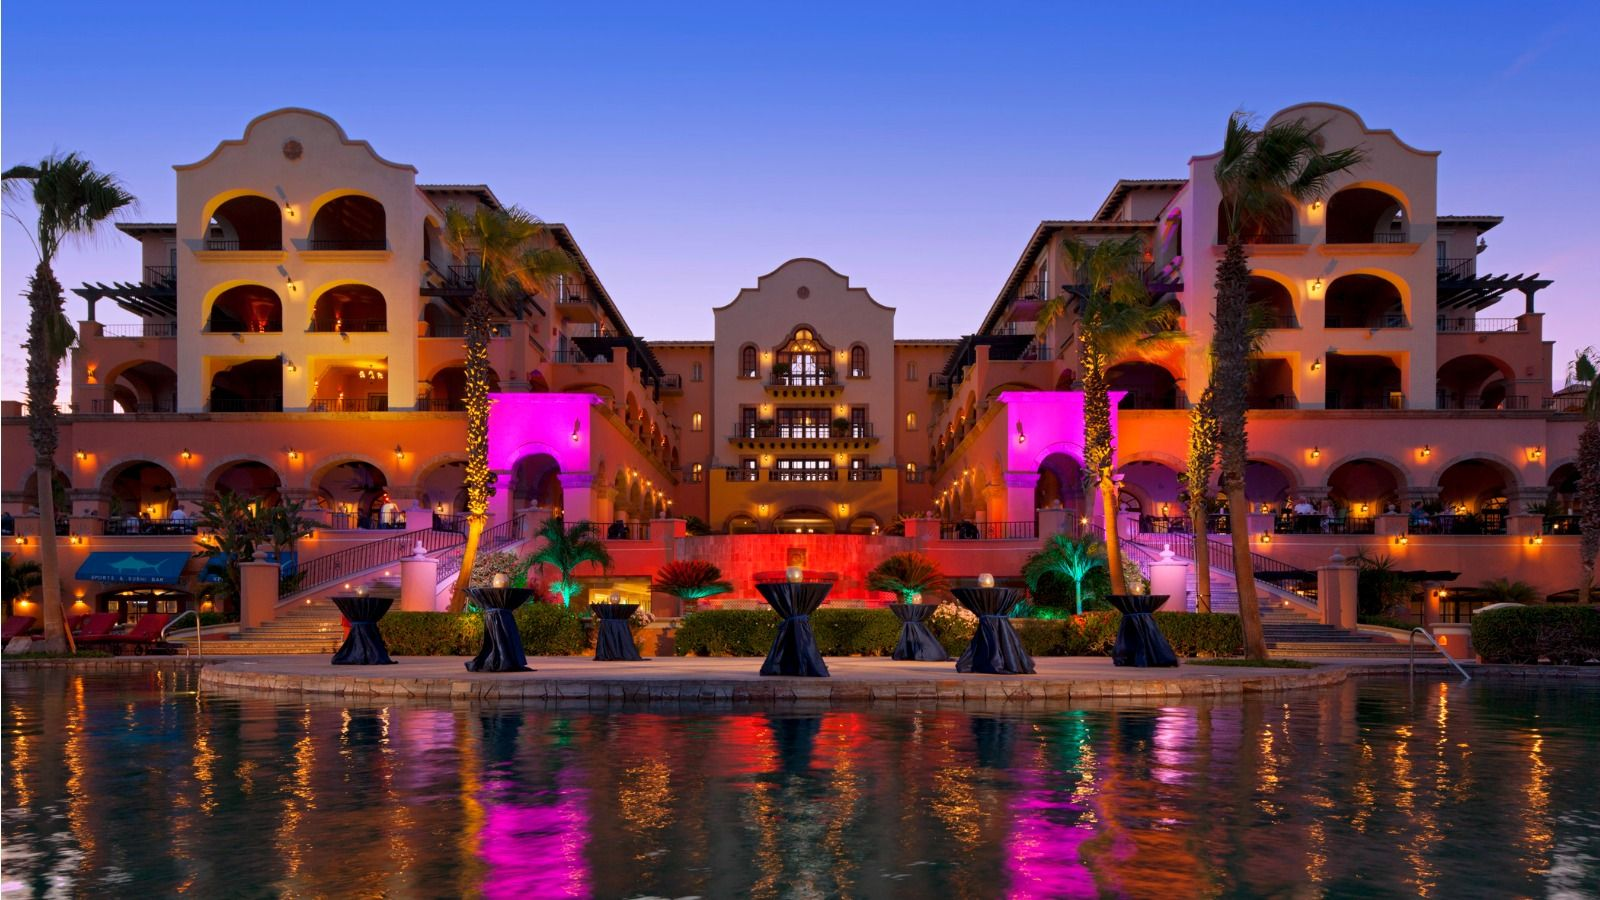 Evening and sunset at Hacienda del Mar Los Cabos Resort - Villas - Golf